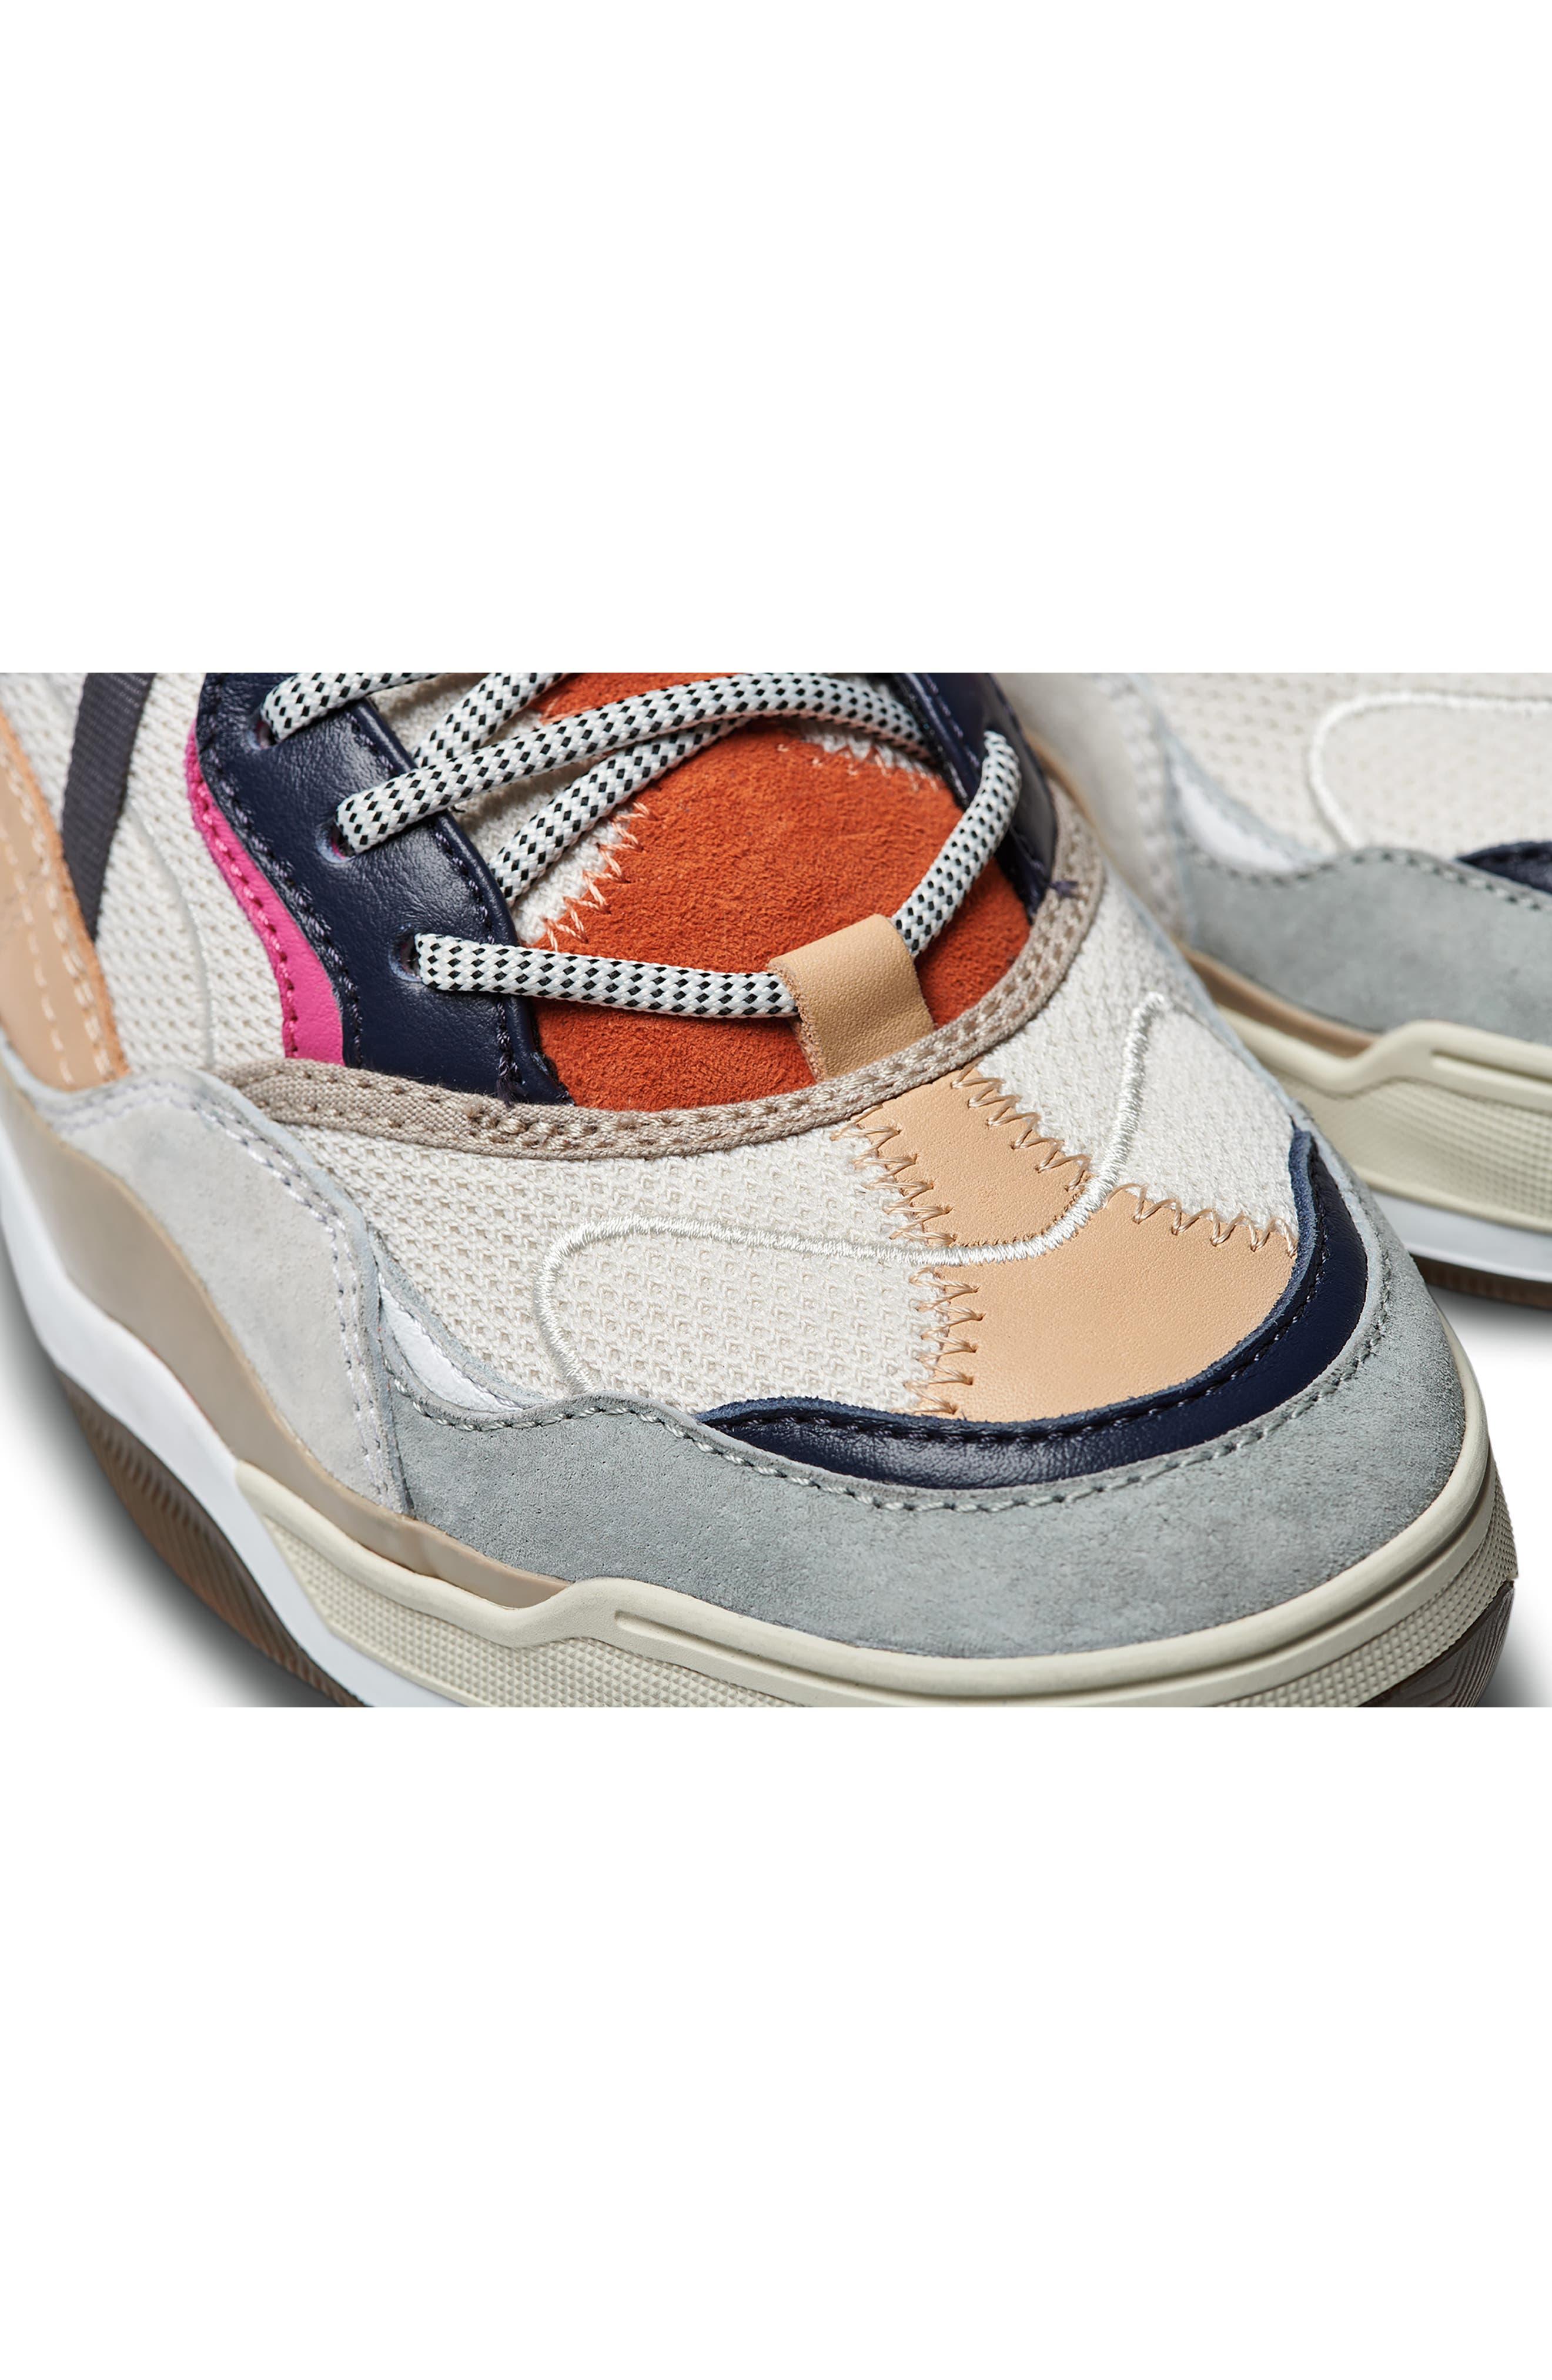 VANS,                             Varix WC Sneaker,                             Alternate thumbnail 10, color,                             TURTLEDOVE/ TRUE WHITE LEATHER